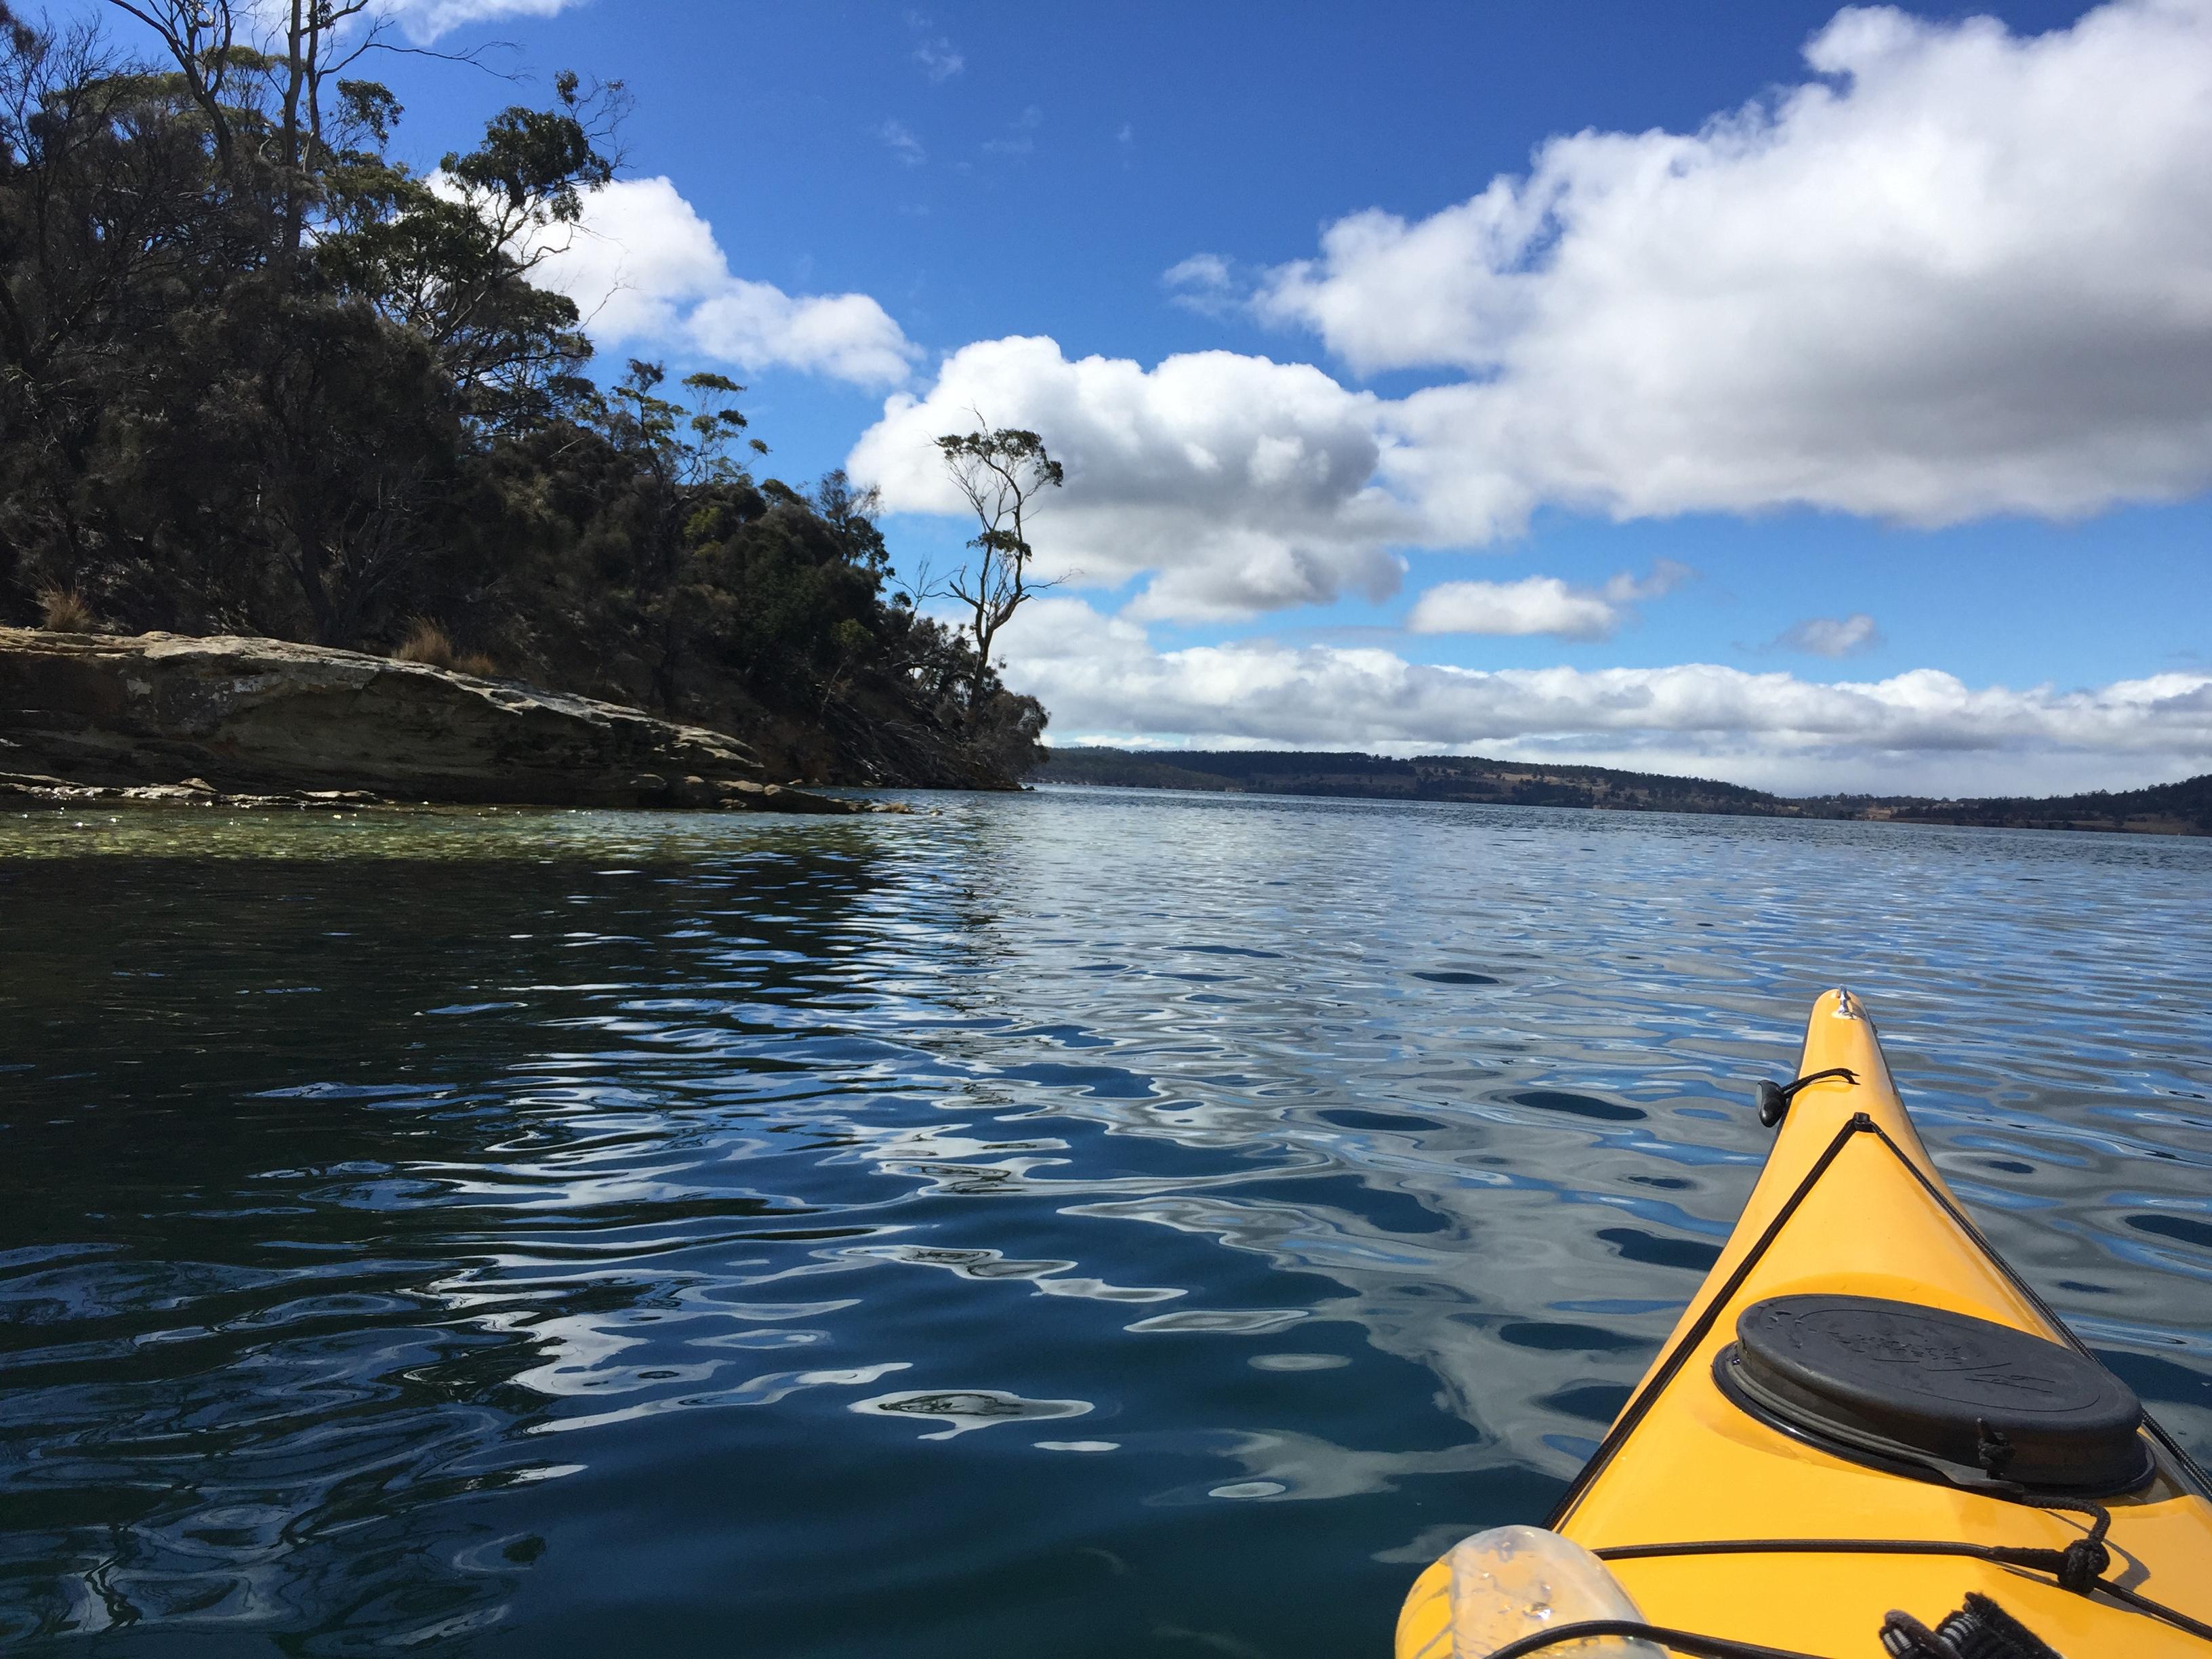 Kayaking on the Derwent, Tasmania